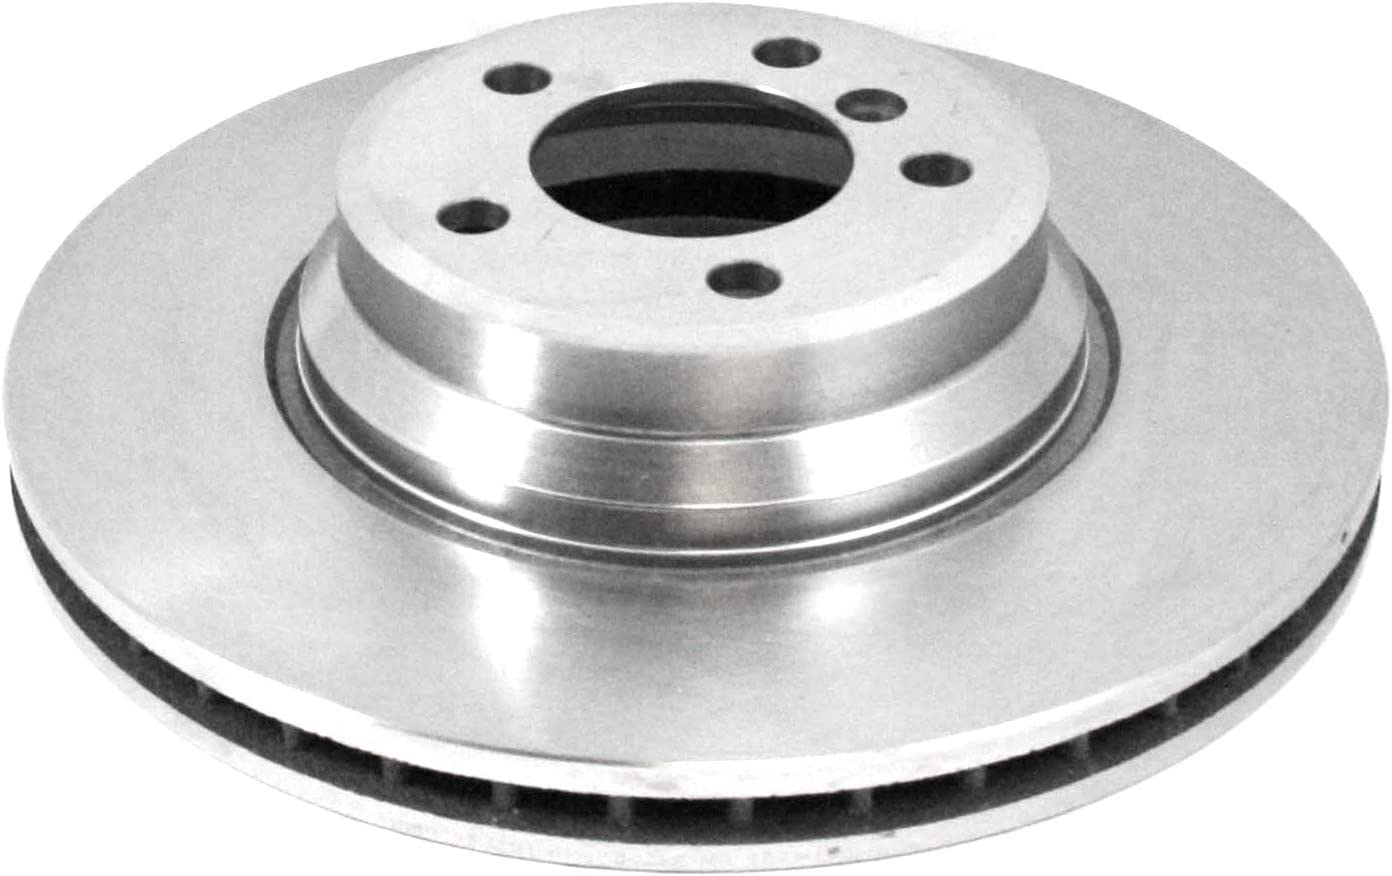 DuraGo BR34250 Front Vented Disc Brake Rotor